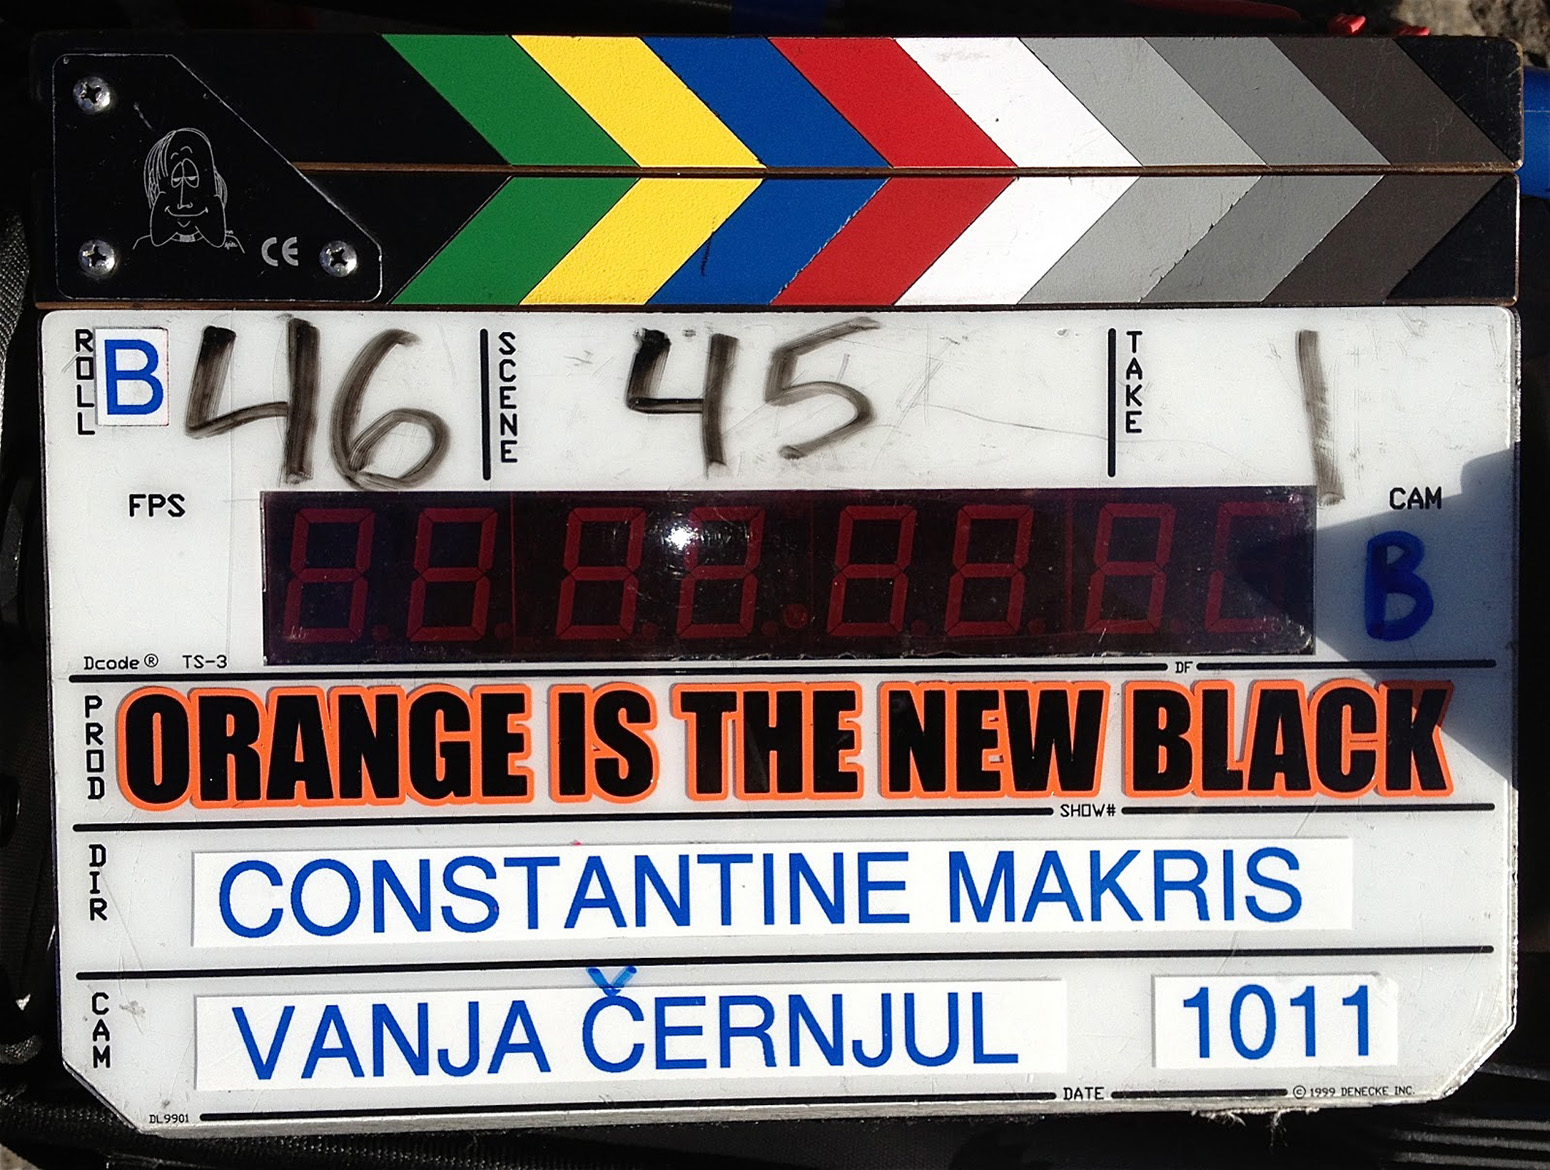 Slate from season 1.